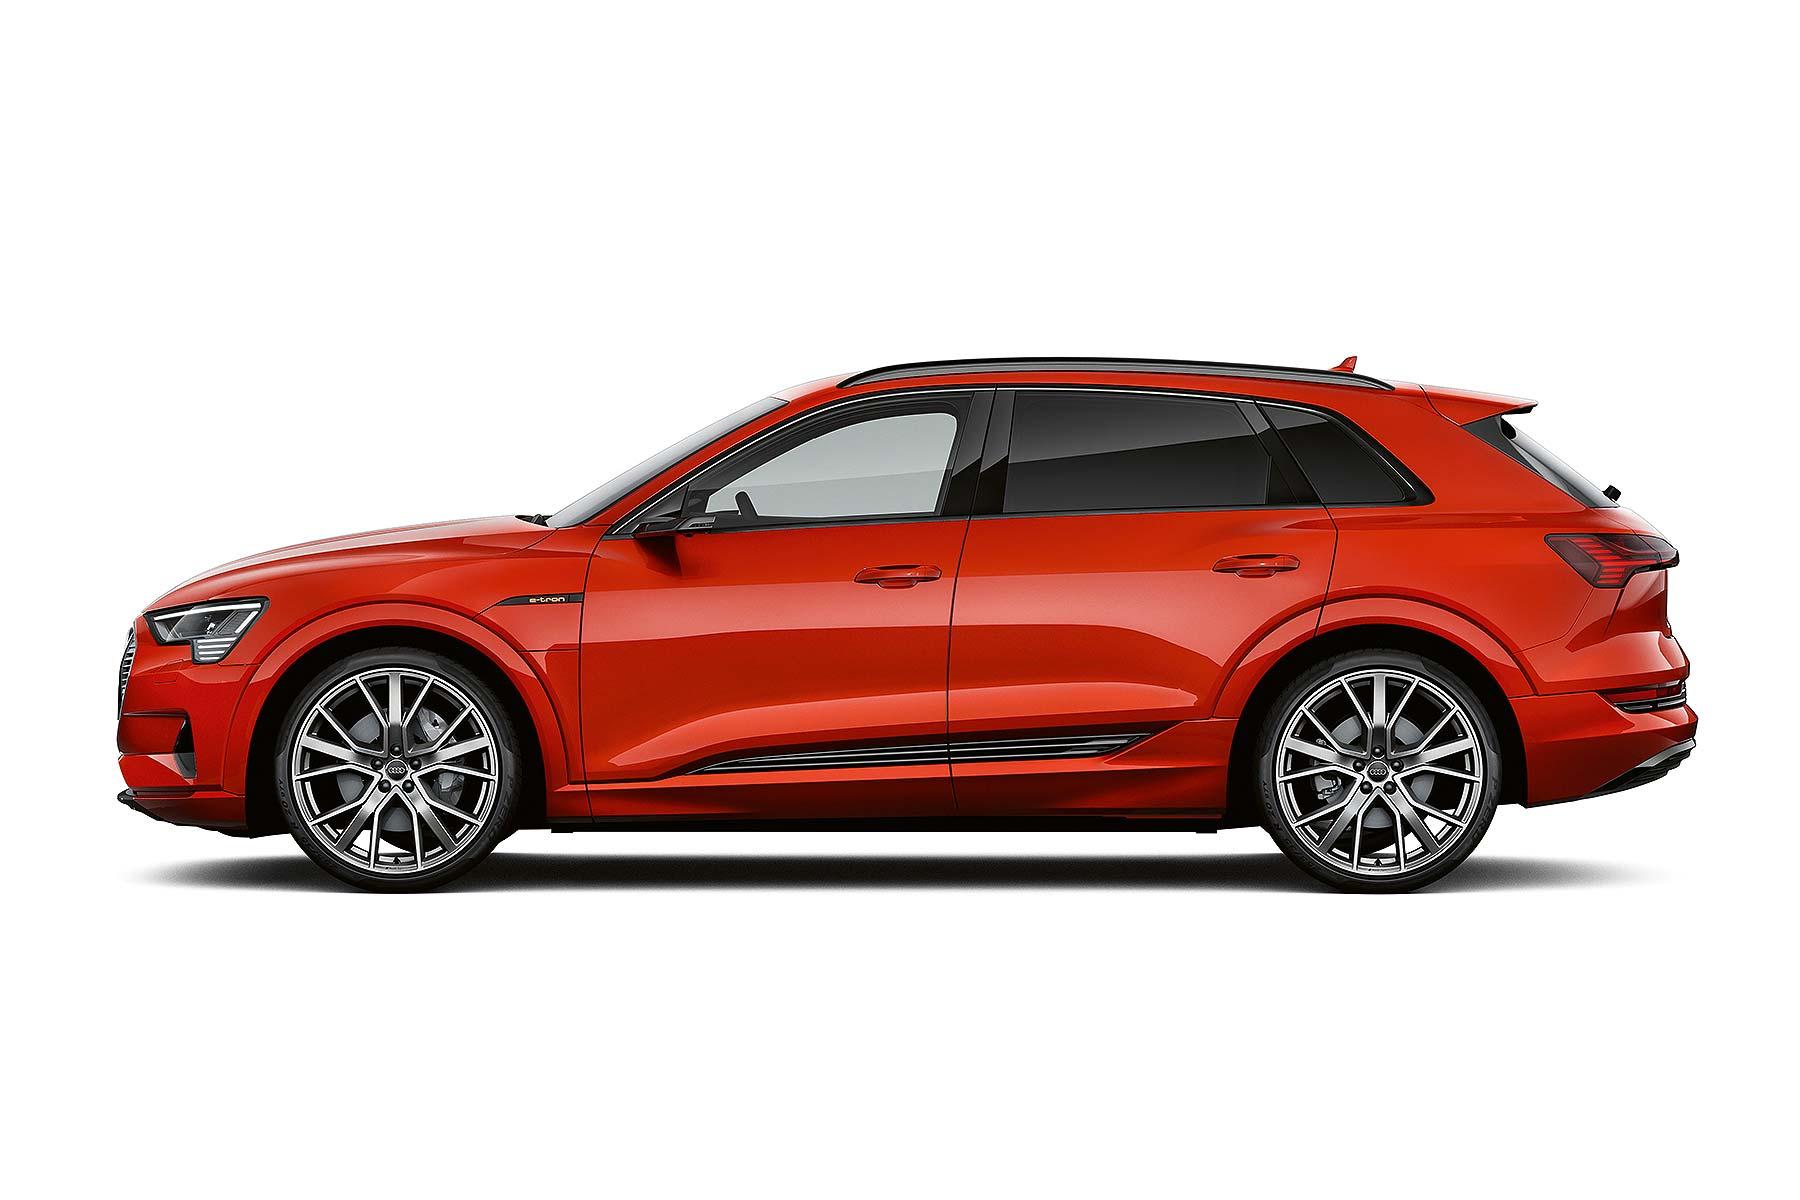 Audi e-tron Launch Edition